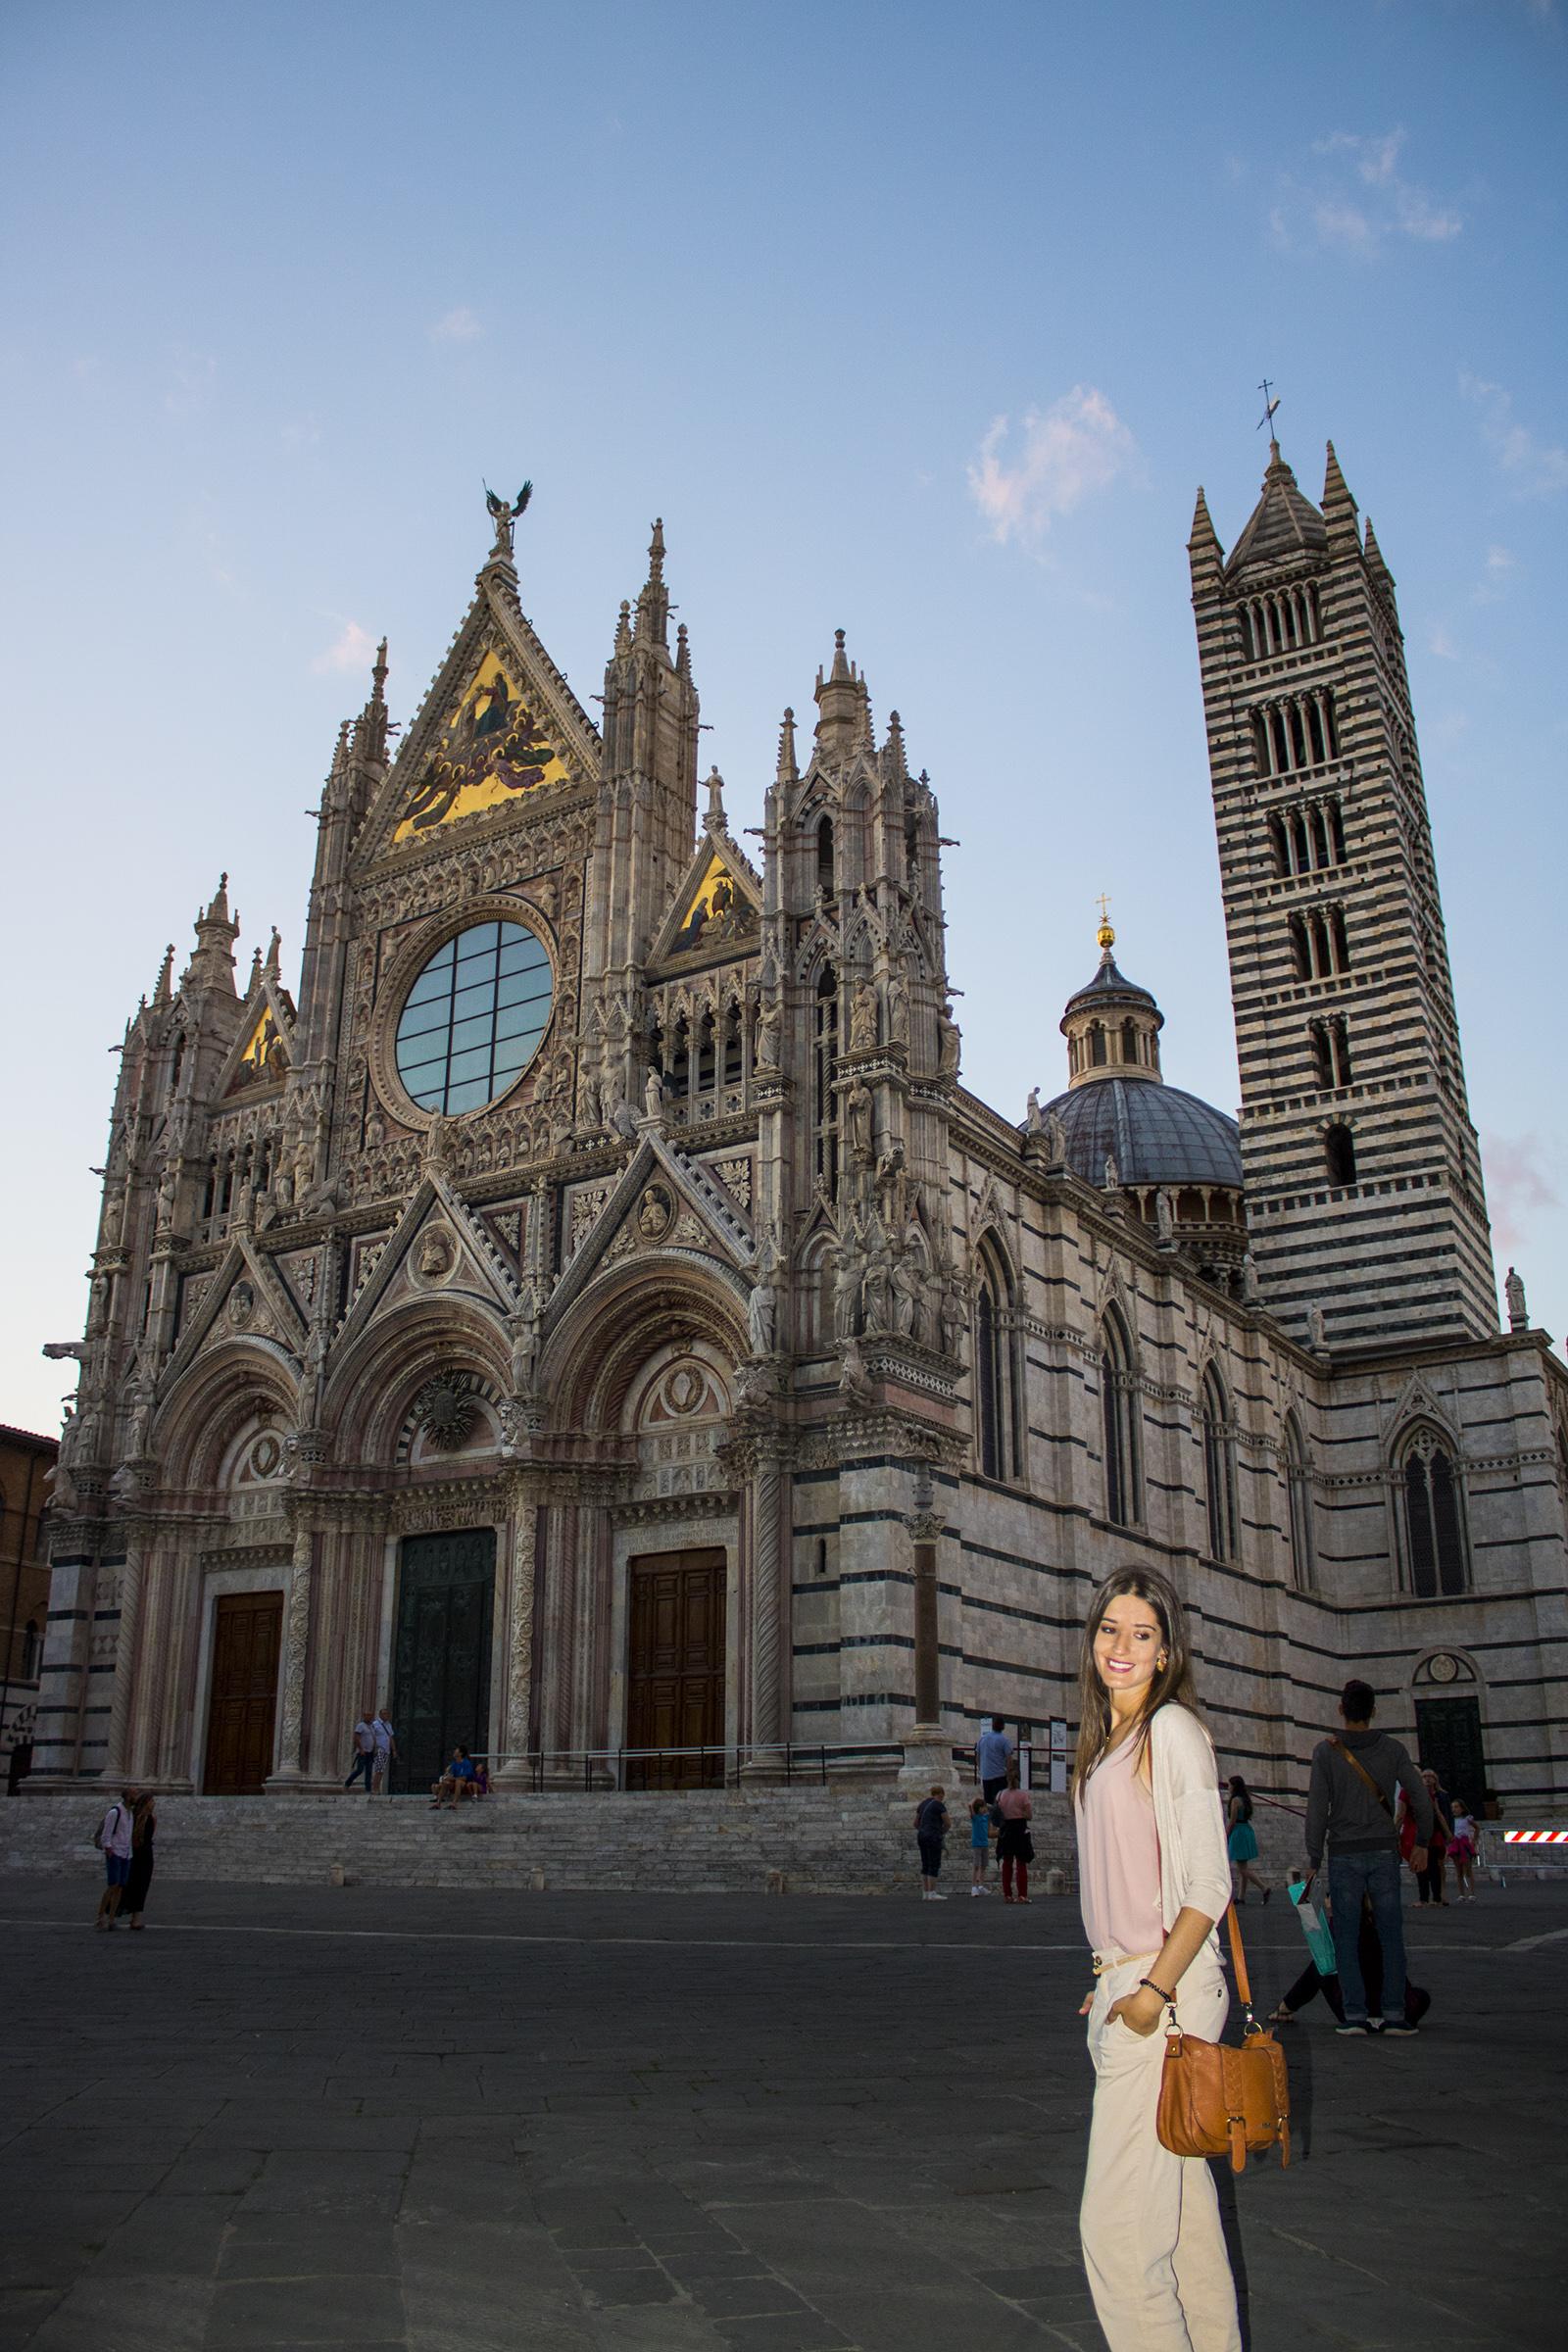 Duomo di Siena 1